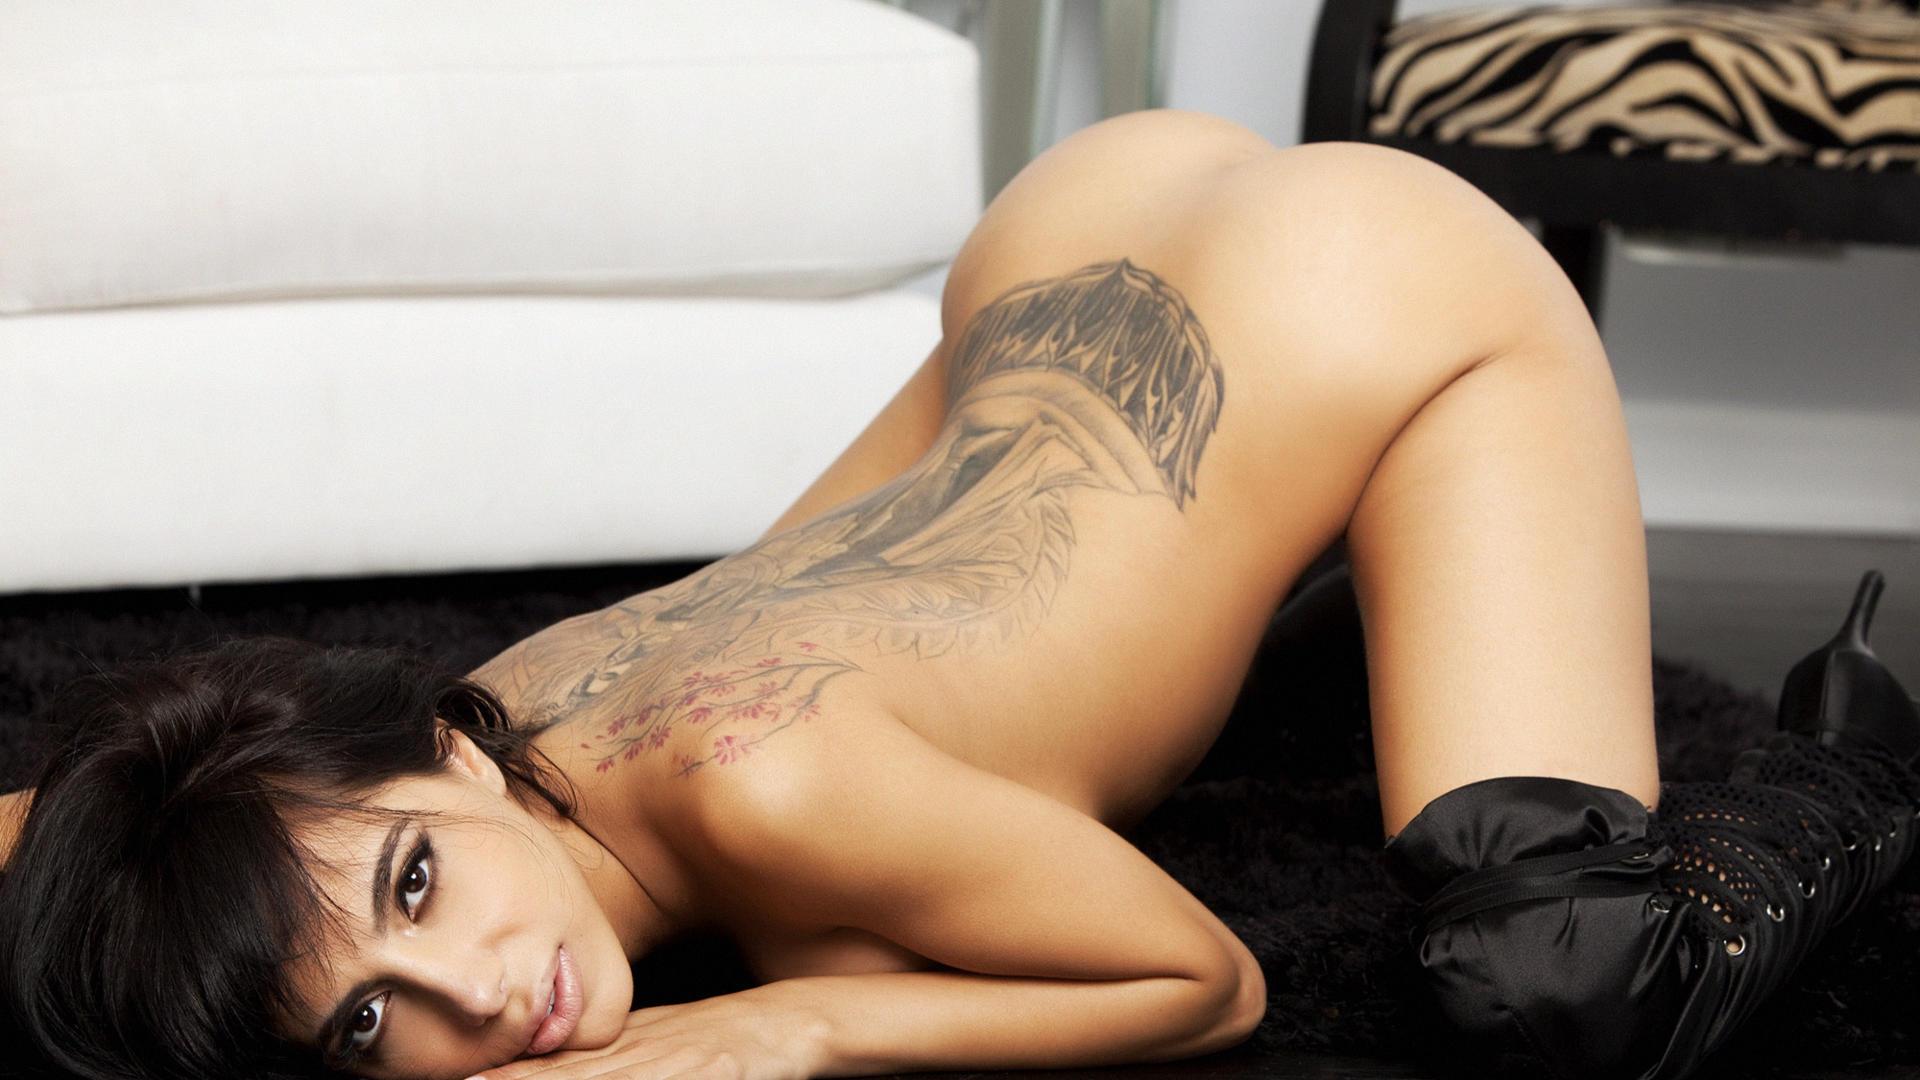 Pretty ass nude